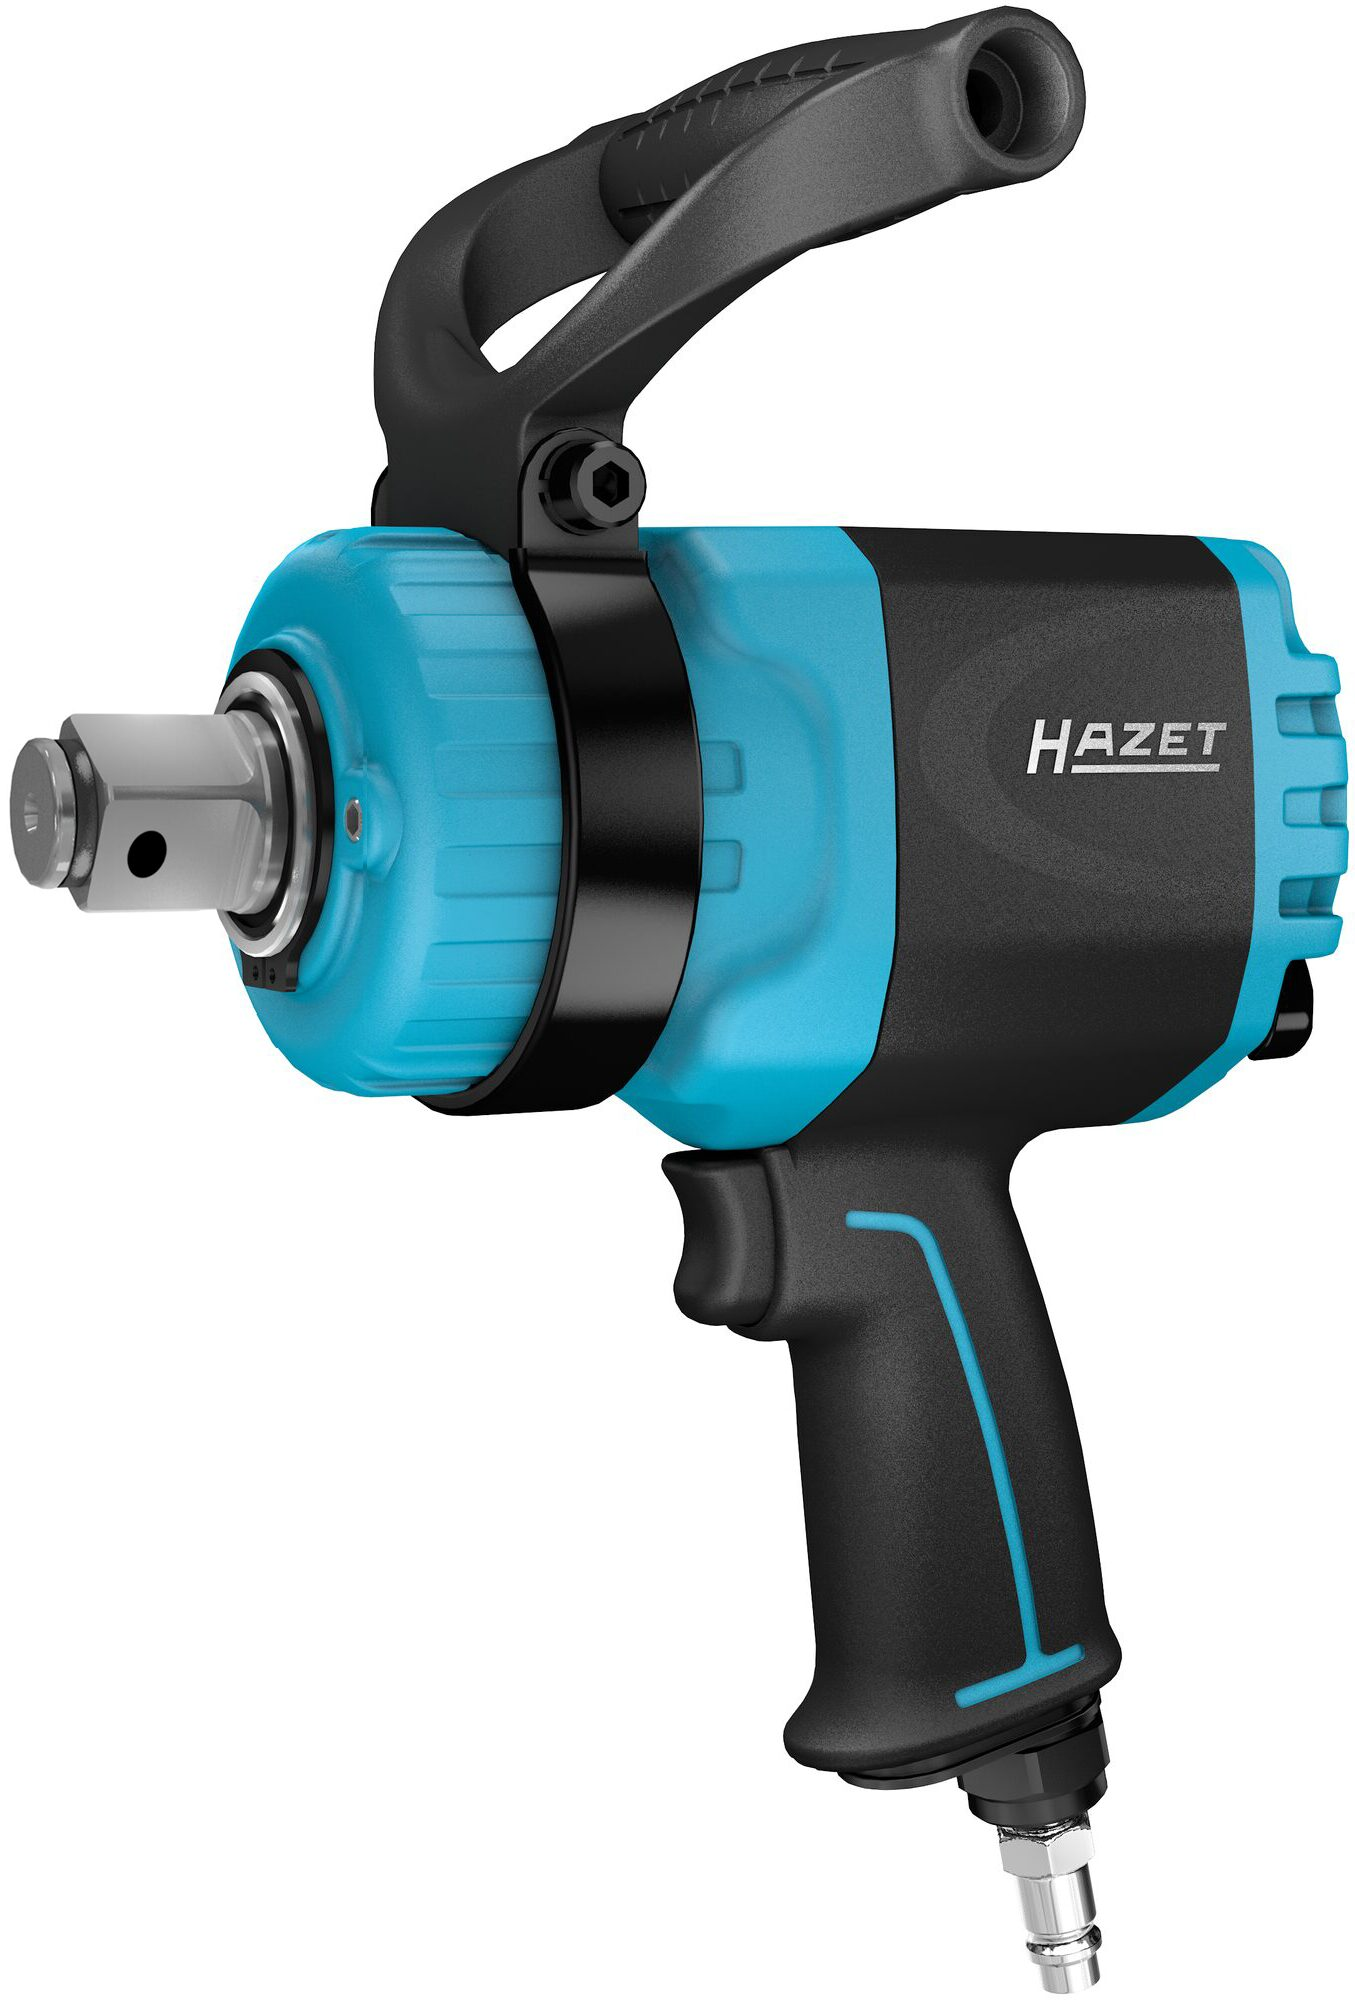 HAZET Twin Turbo Schlagschrauber 9014TT ∙ Lösemoment maximal: 4100 Nm ∙ Vierkant massiv 25 mm (1 Zoll)